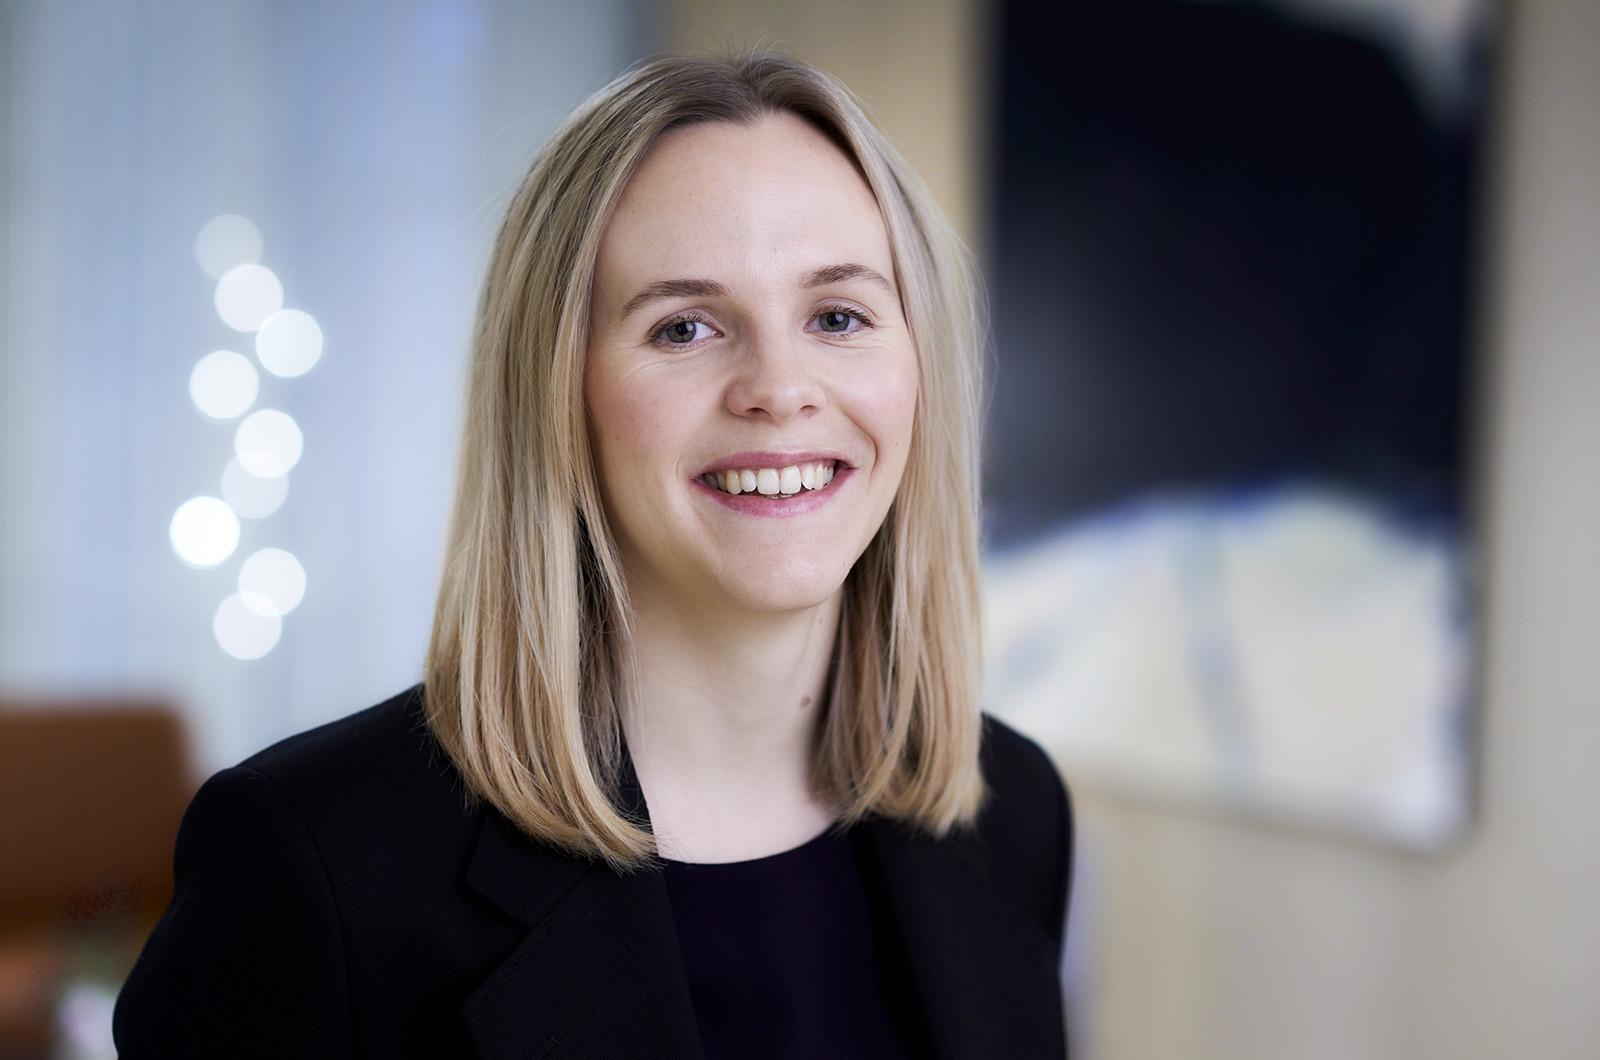 Maria Skuggevik Slotnes